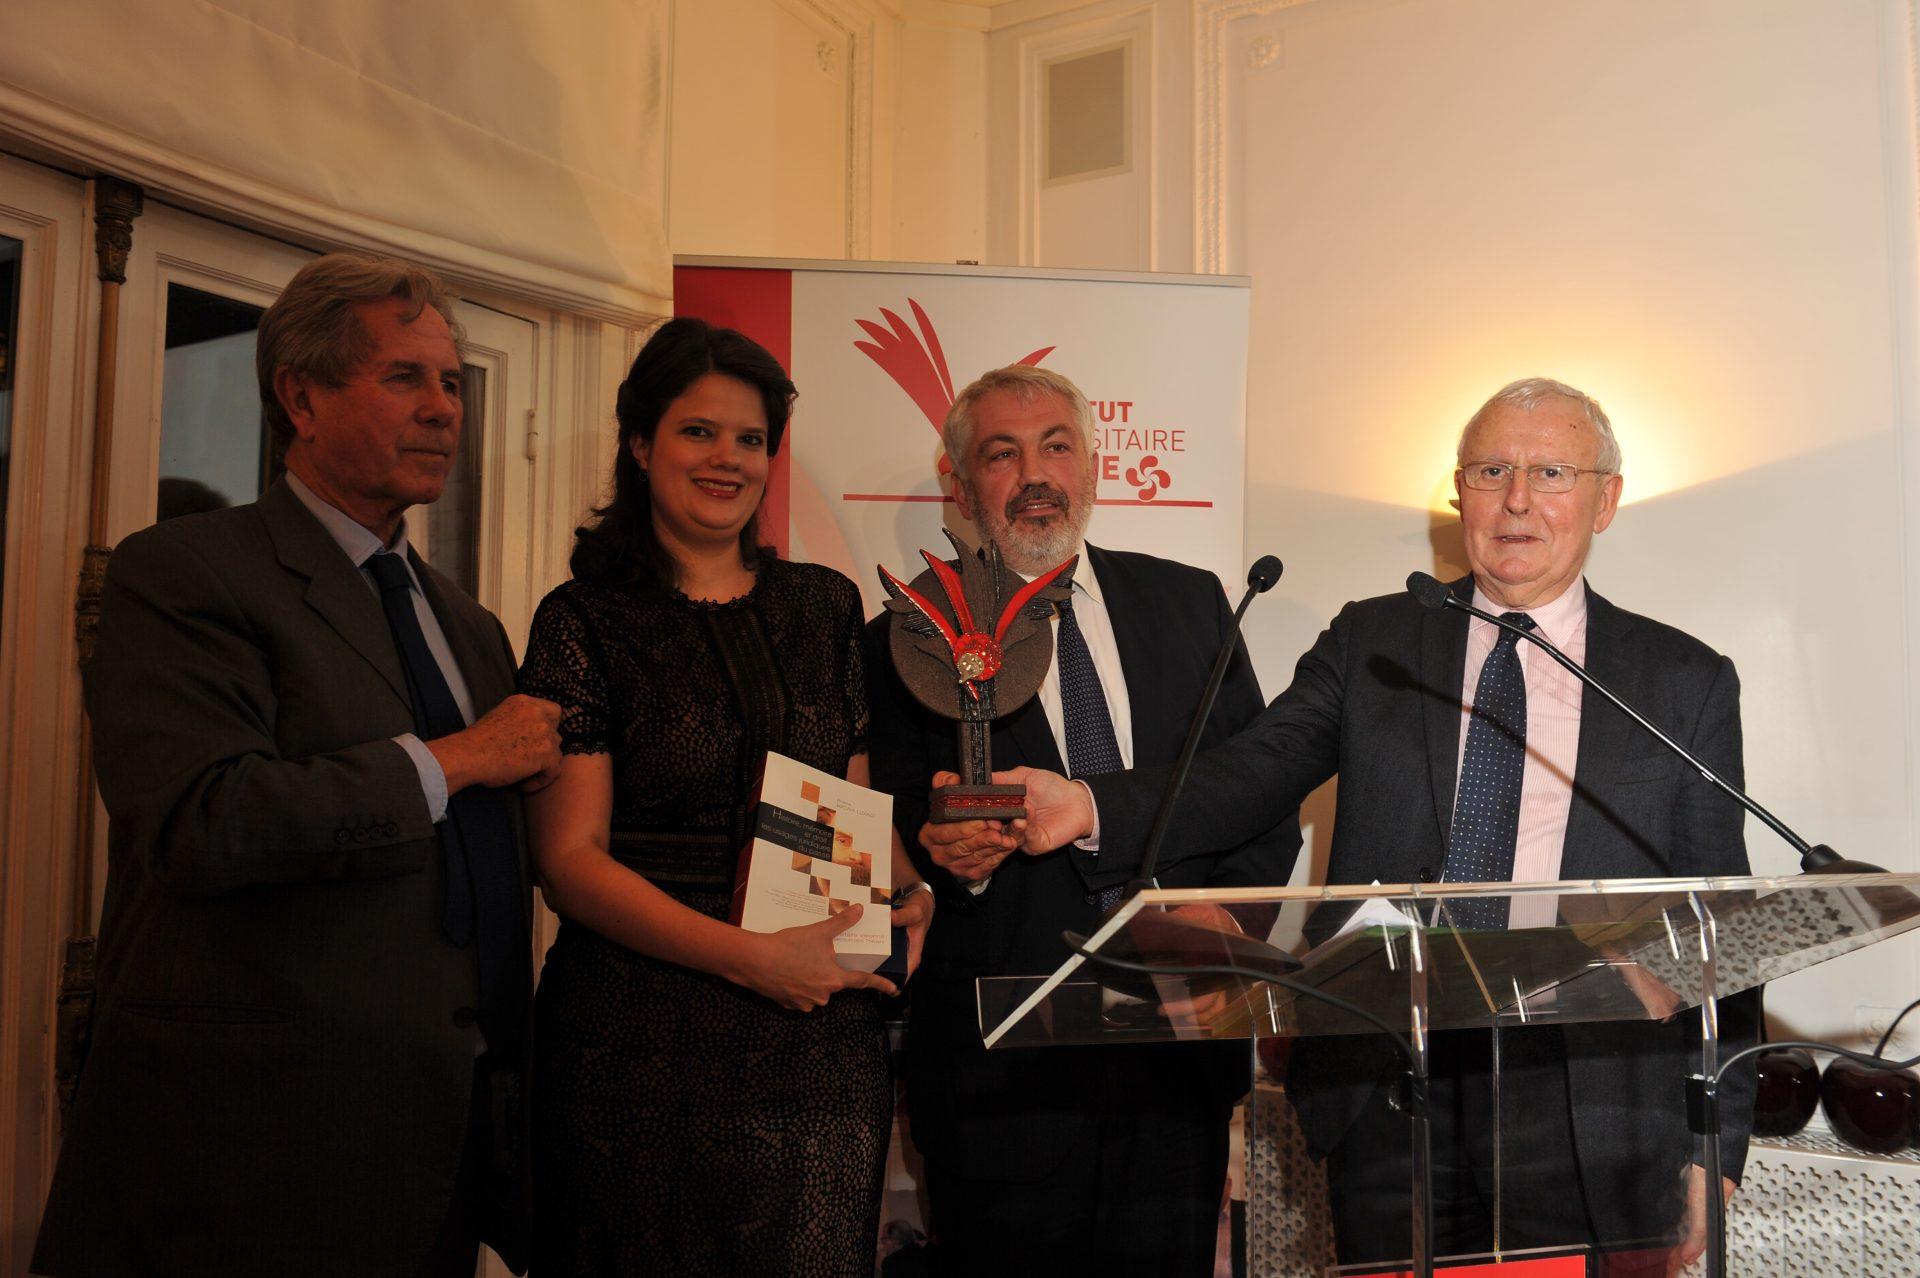 Ariana Macaya Lizano, Lauréate dans la catégorie Démocratisation